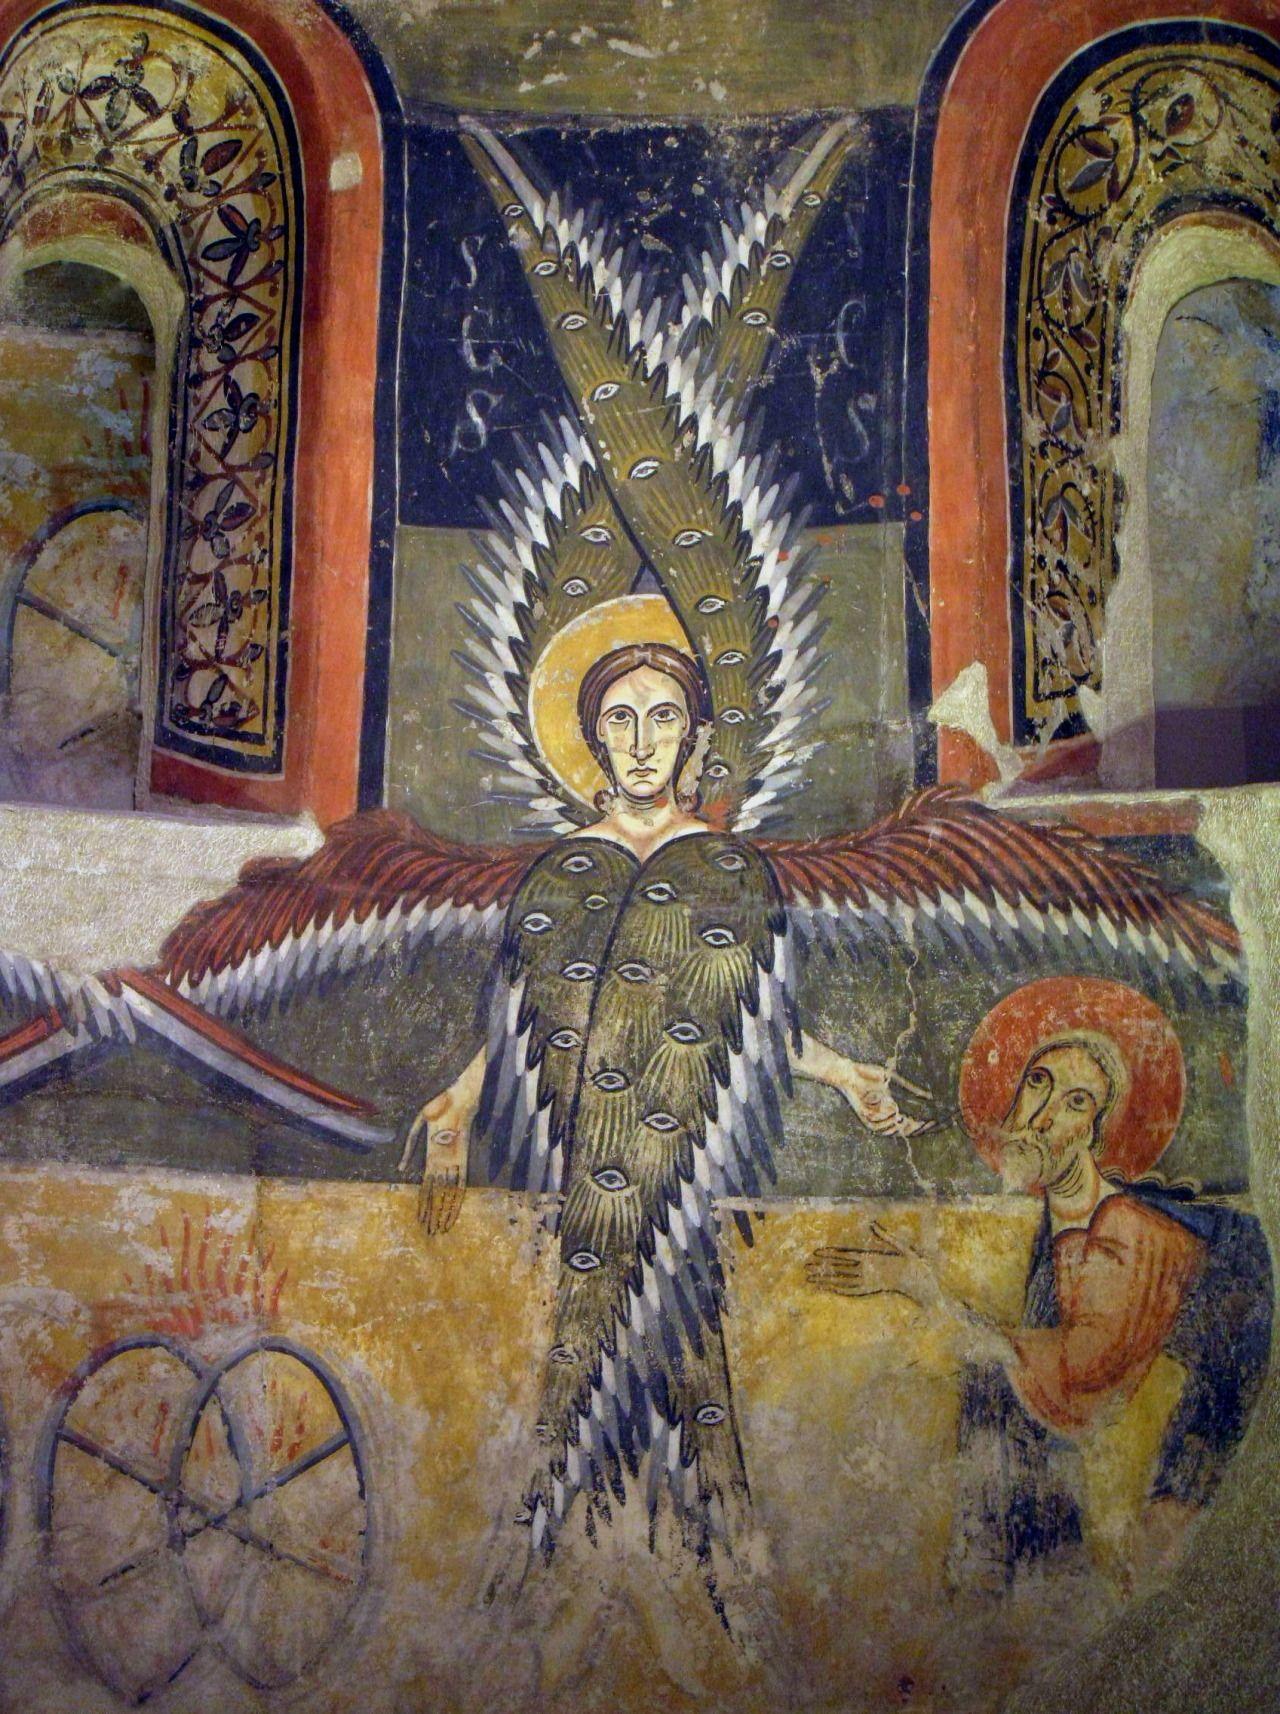 Pin by Grace Patey on Dissertation in 2019 | Angel art, Seraph angel